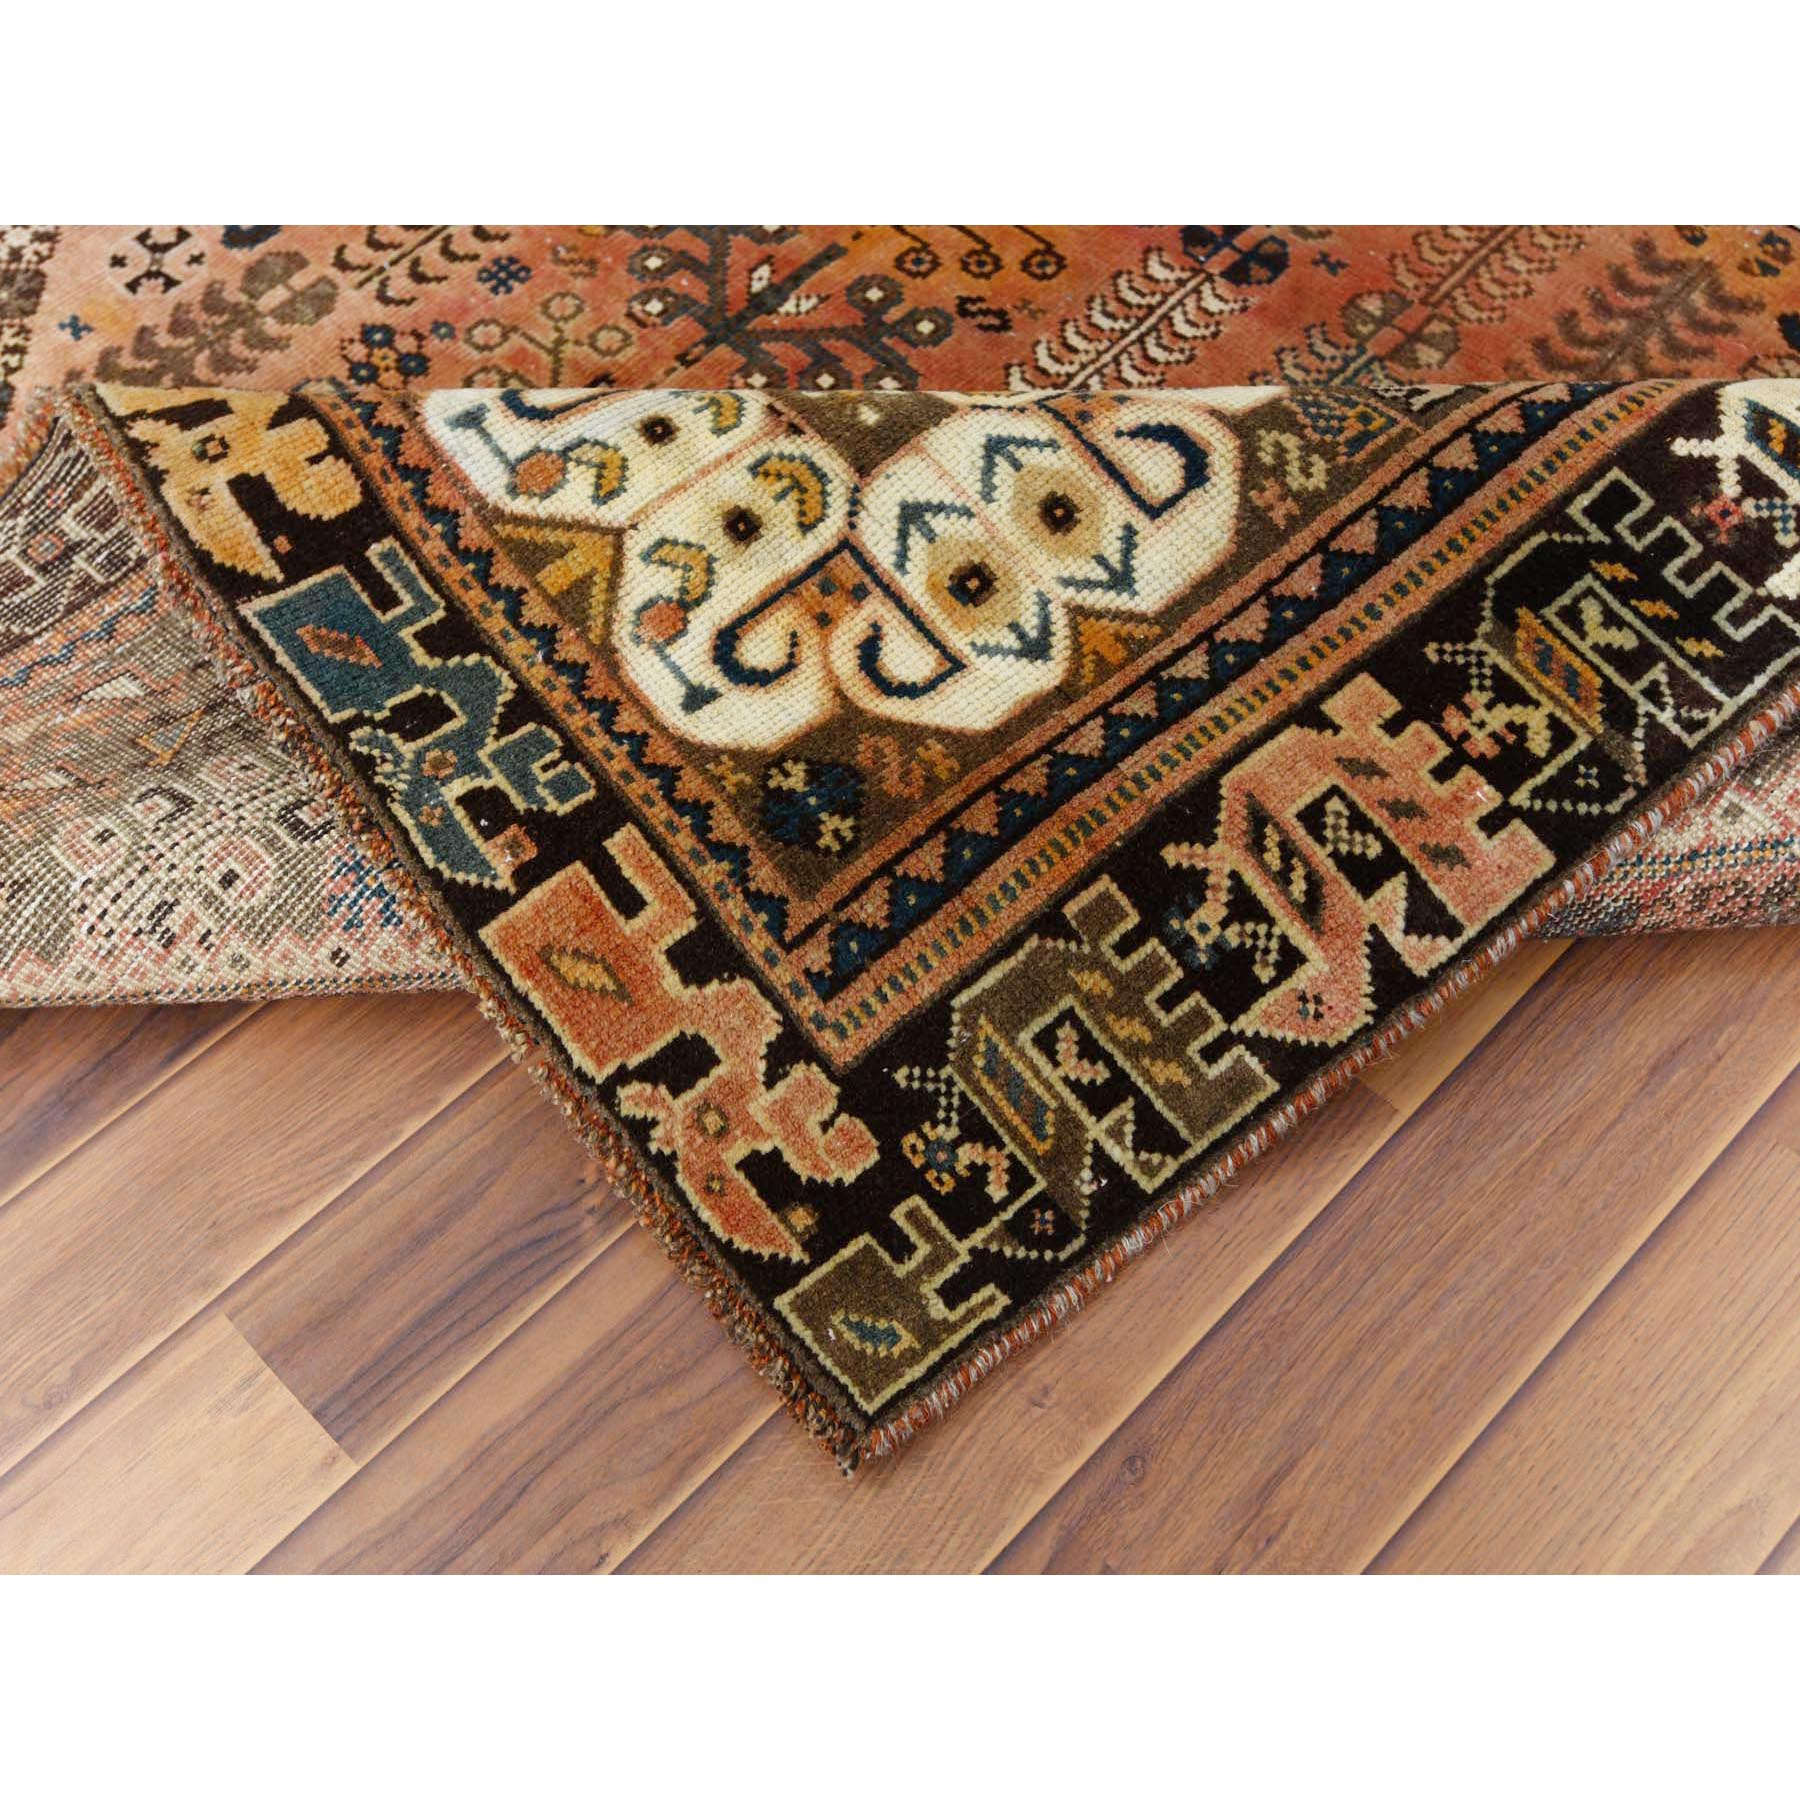 "6'x9'4"" Orange Hand Knotted Vintage Persian Qashqai Clean Worn Down Geometric Design Oriental Rug"